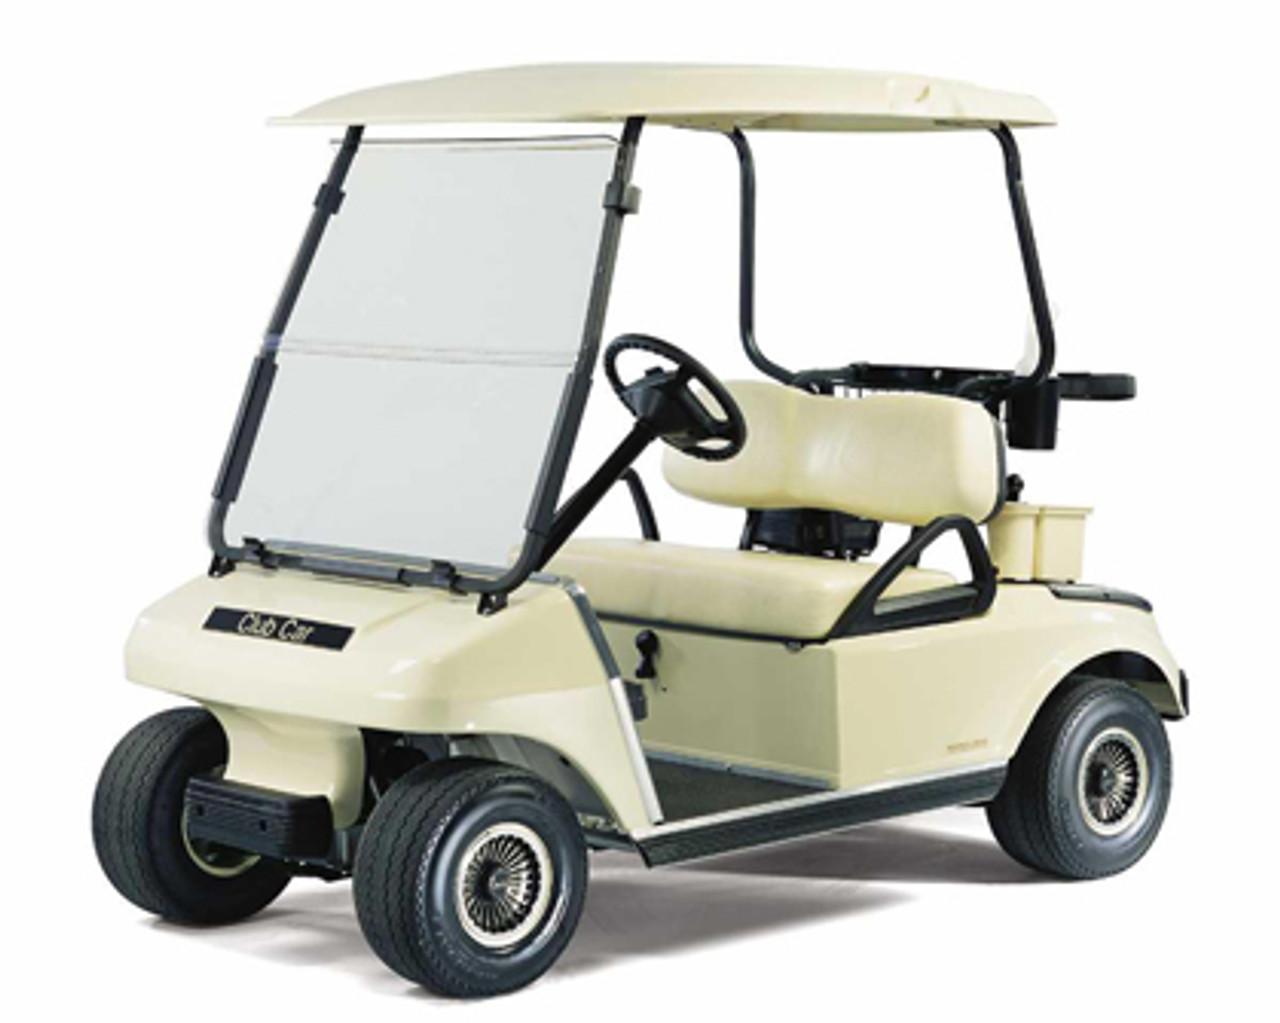 Golf Cart Rear Seat Kit - EZGO, Club Car & Yamaha Golf Carts Push Bar For Yamaha Golf Cart on nerf bars for golf carts, push bars for trucks, push bars for cars, push bars for go carts, roll bars for golf carts, push bars for doors,